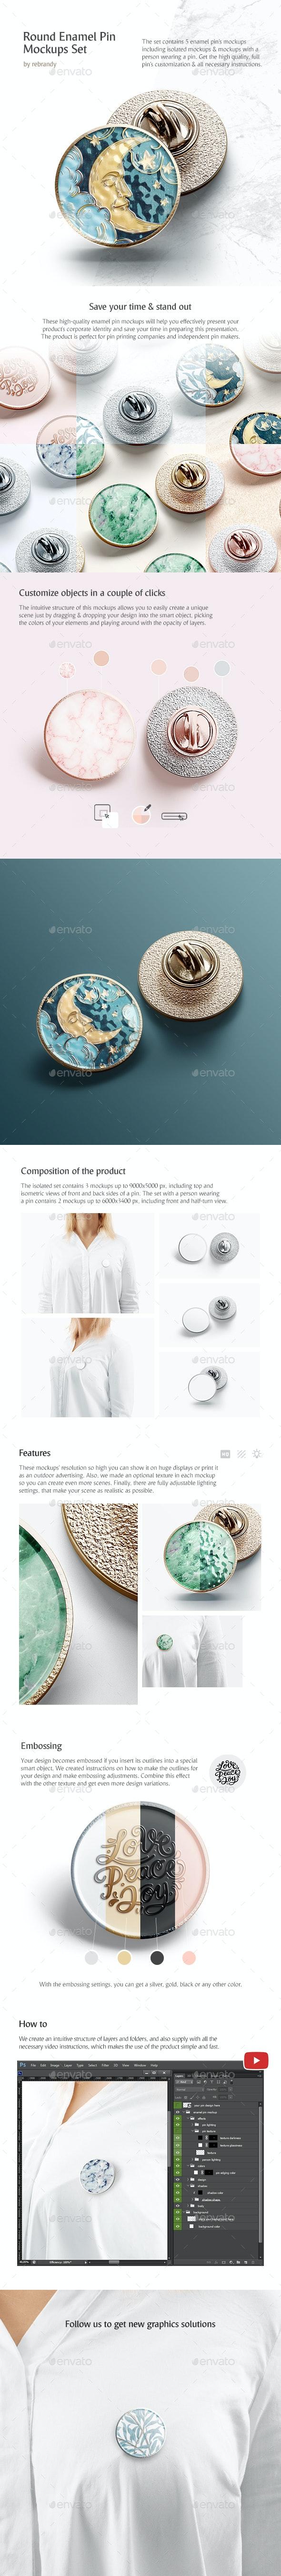 Round Enamel Pin Mockups Set by rebrandy   GraphicRiver